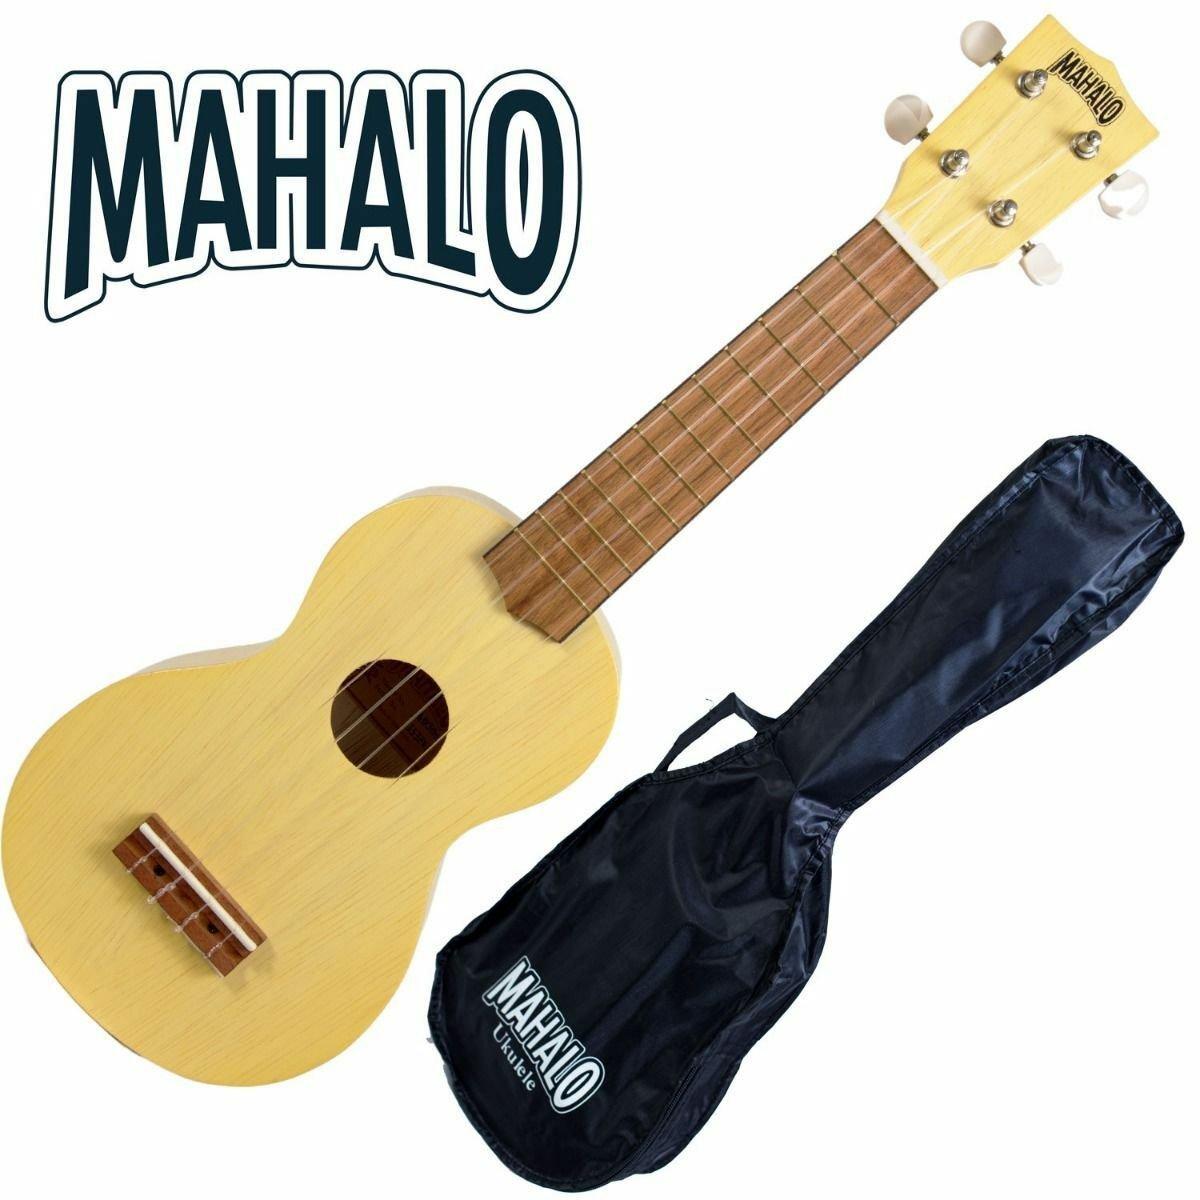 Mahalo MK1 Transparent Butterscoth Soprano Ukulele